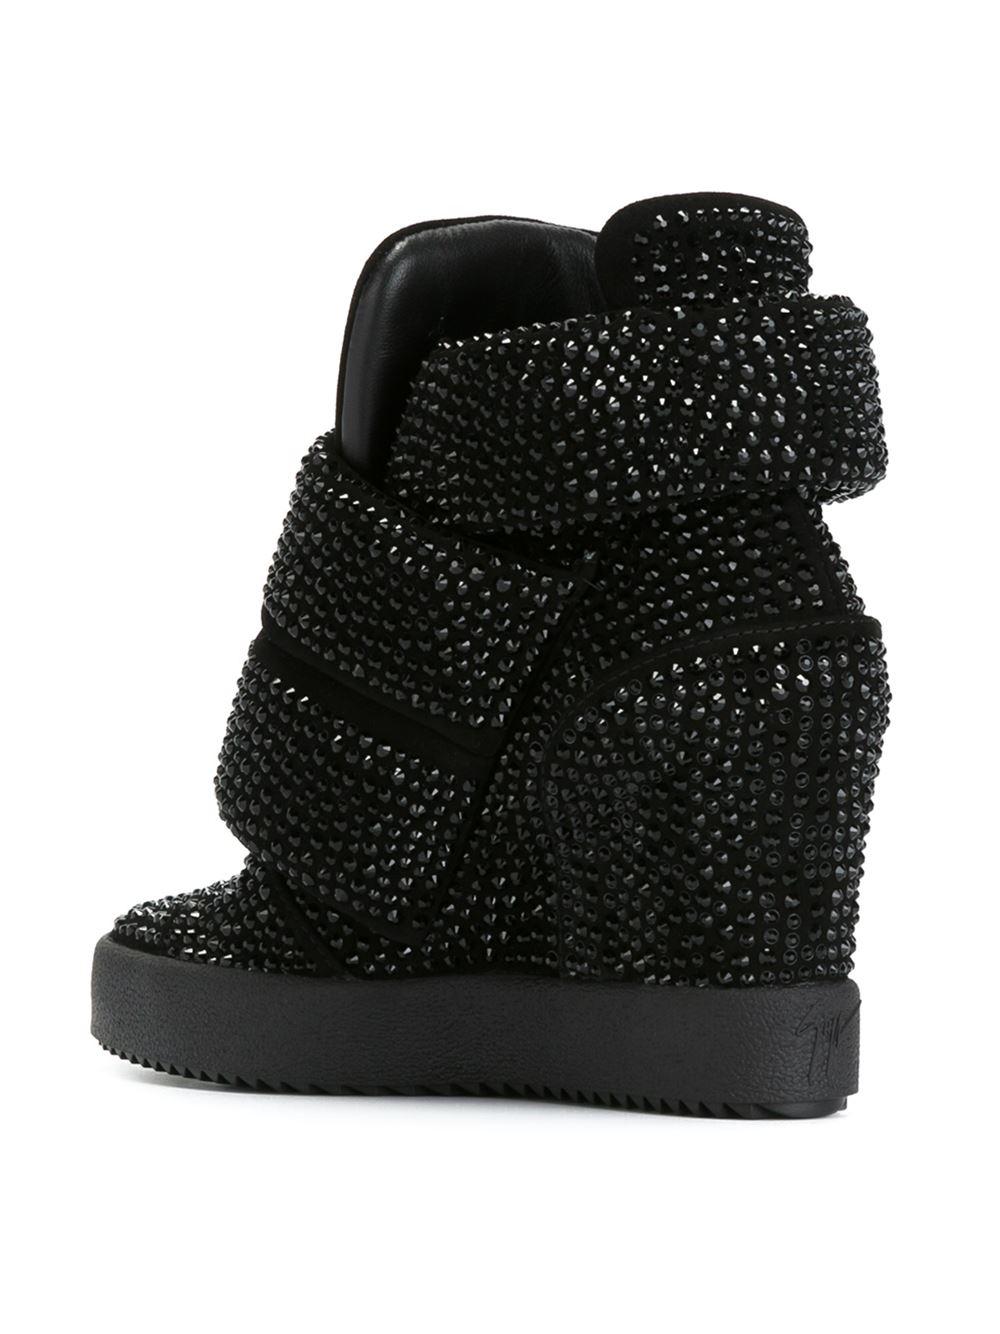 b0842fffa4c Lyst - Giuseppe Zanotti Hi-top Sneakers With Rhinestones in Black